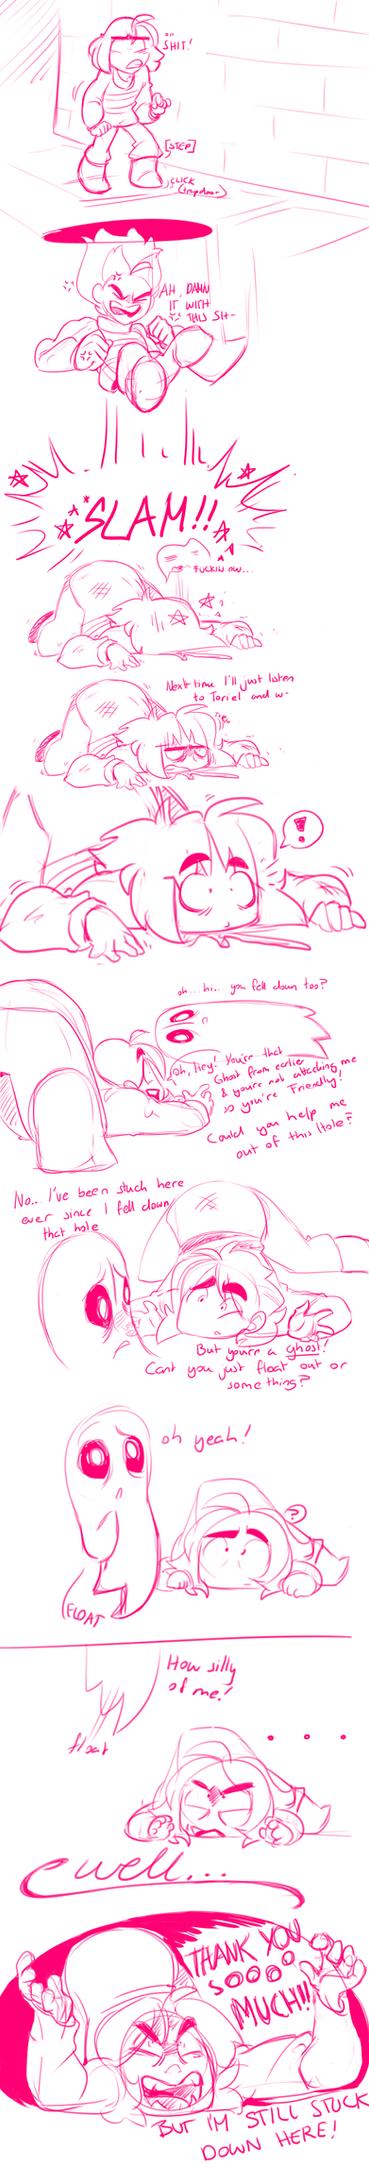 Undertale: Uselessblook damn it heeeeelp me you- by asianpie